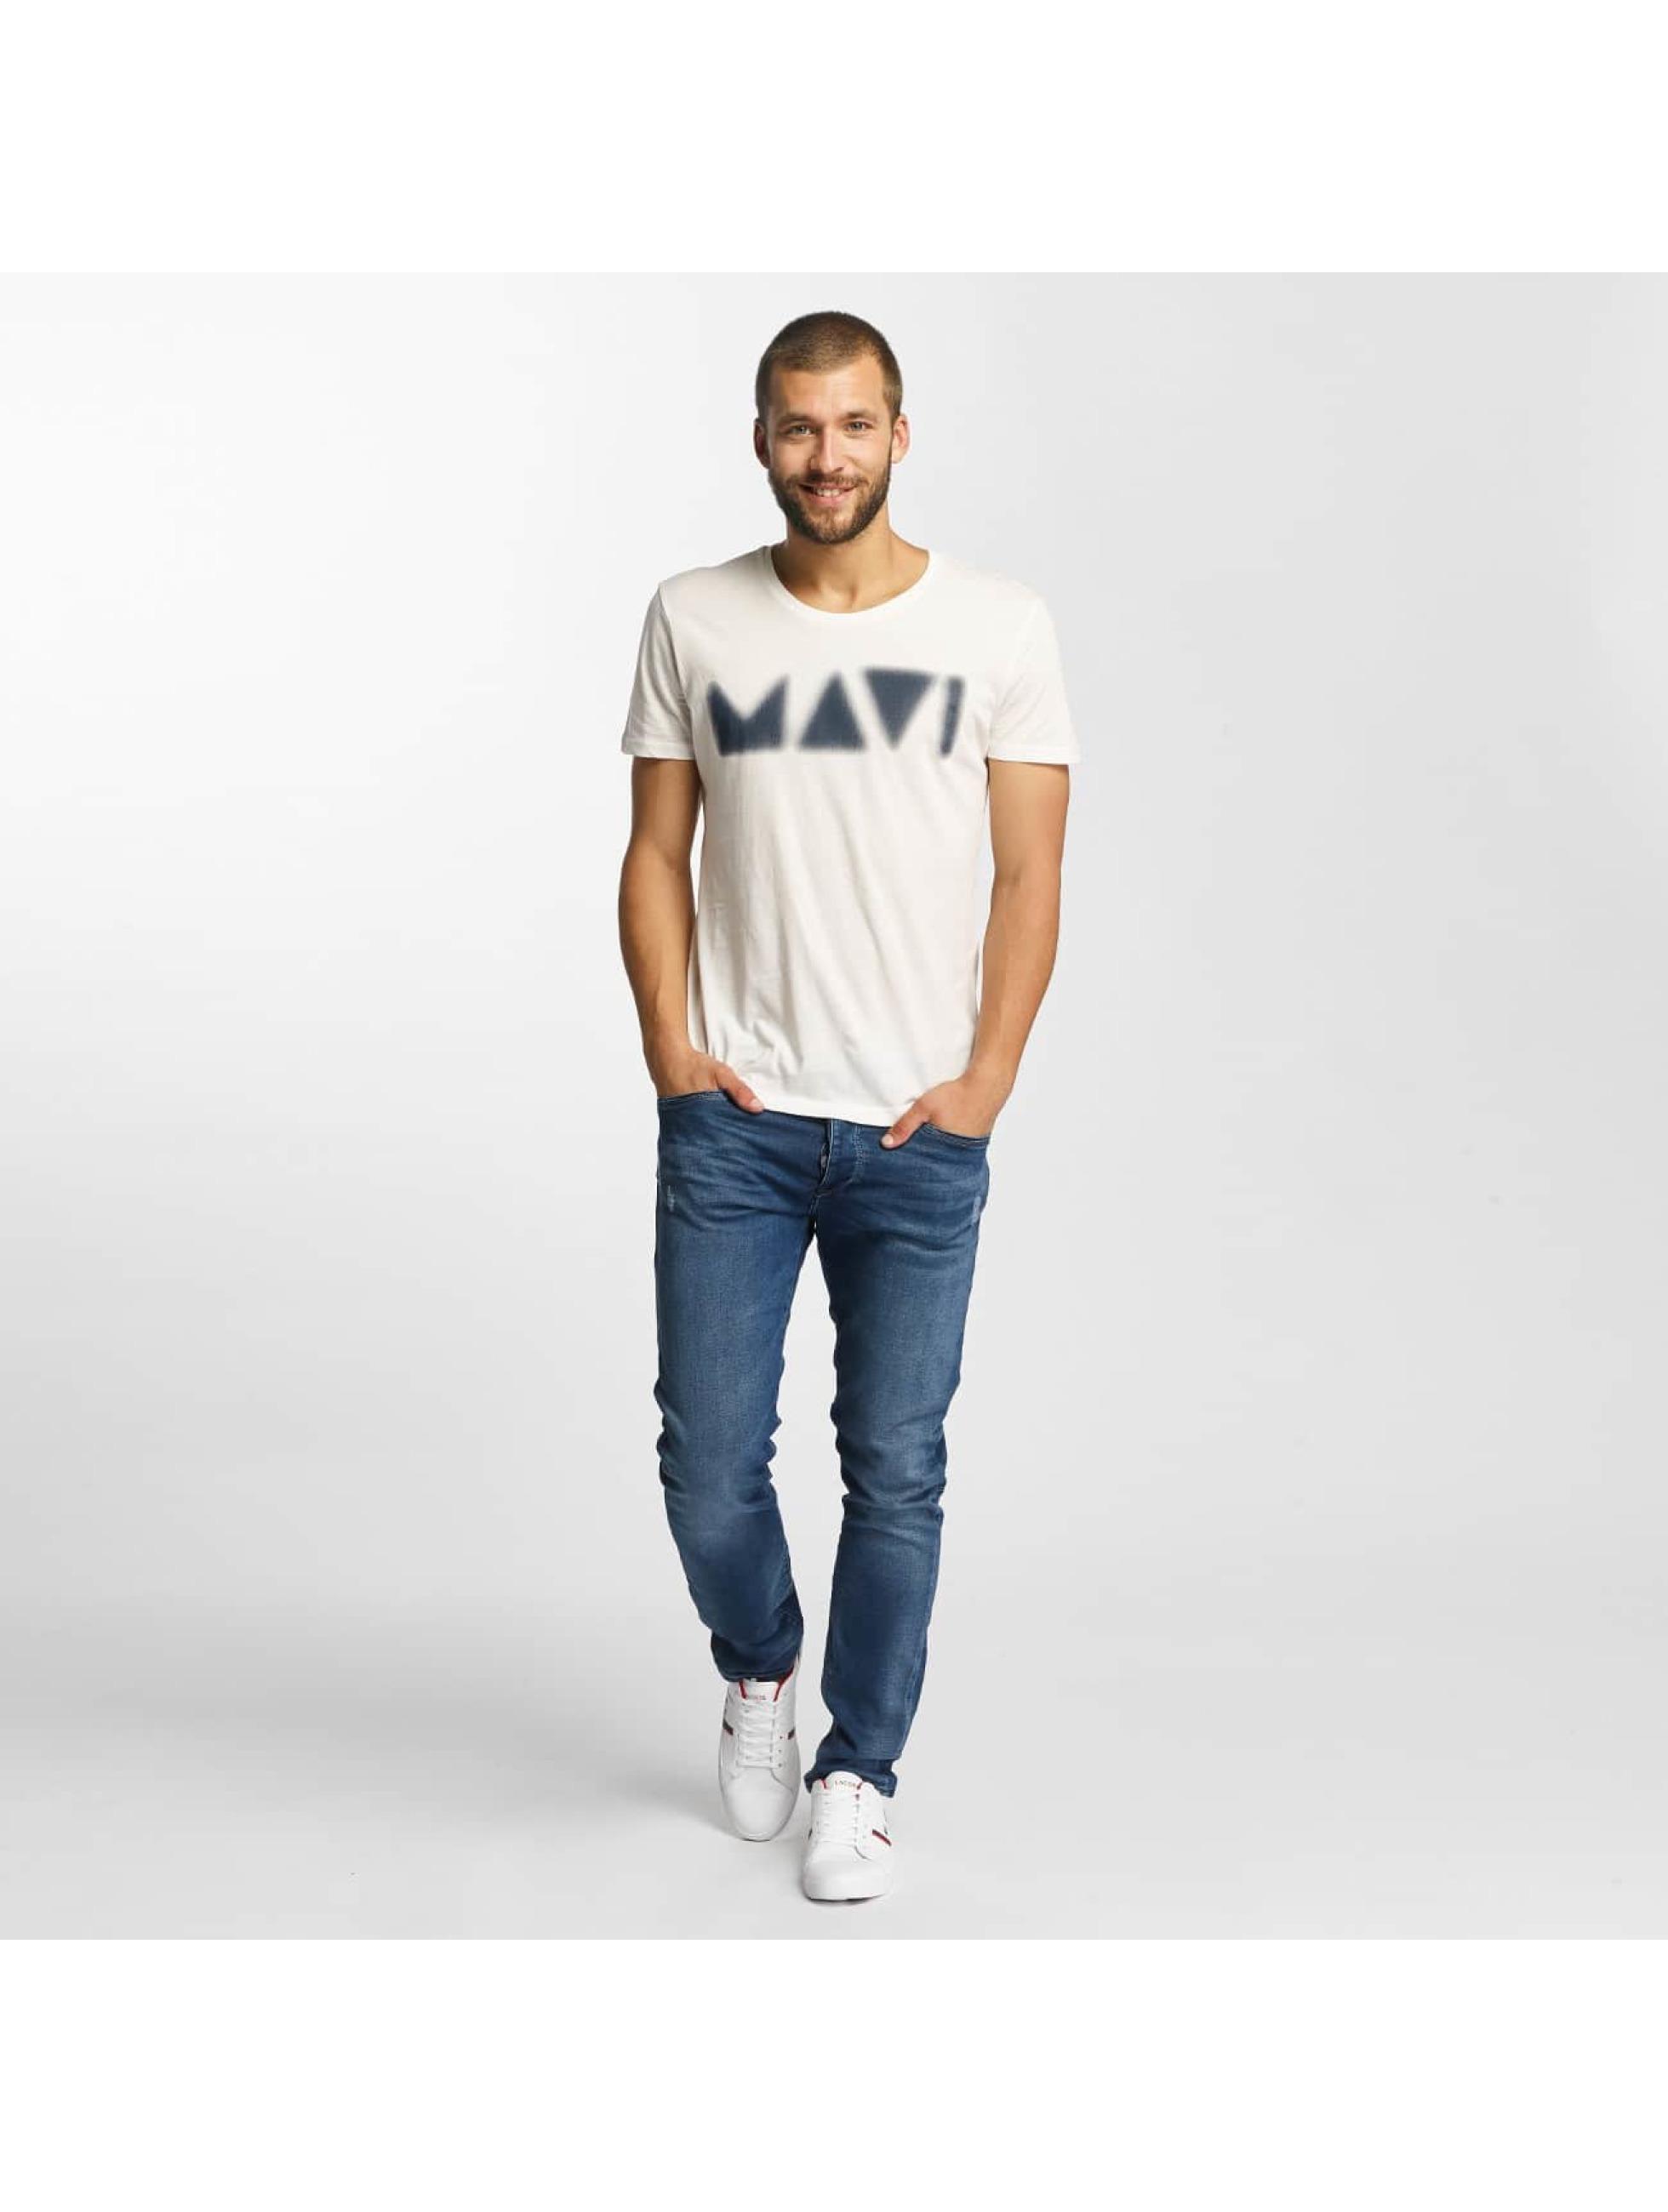 Mavi Jeans T-skjorter Printed hvit